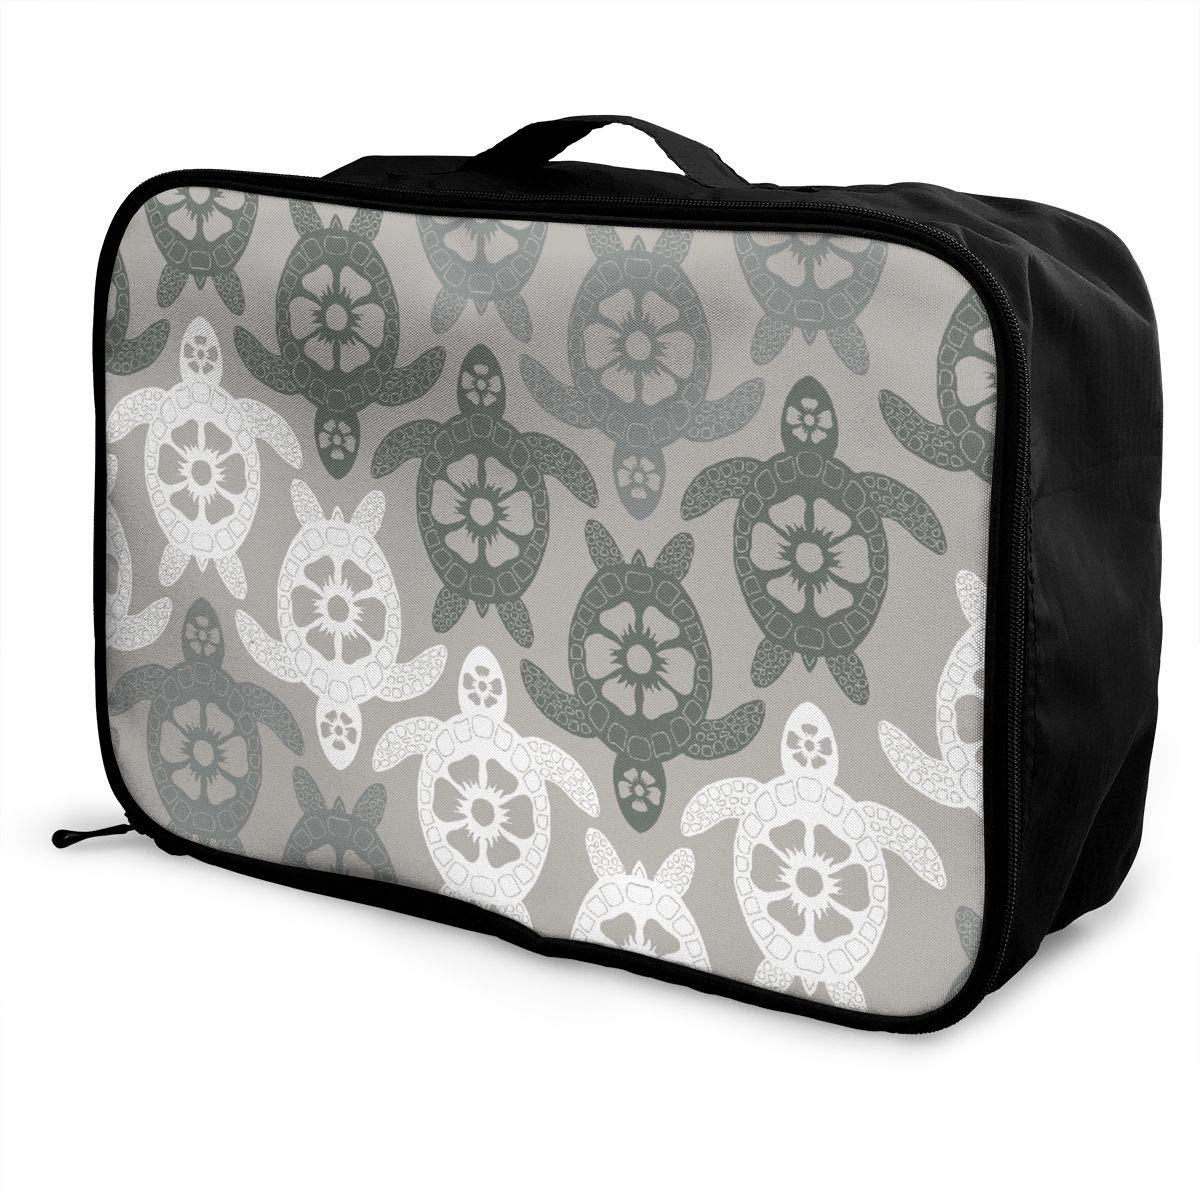 YueLJB Blue Tortoise Pattern Lightweight Large Capacity Portable Luggage Bag Travel Duffel Bag Storage Carry Luggage Duffle Tote Bag